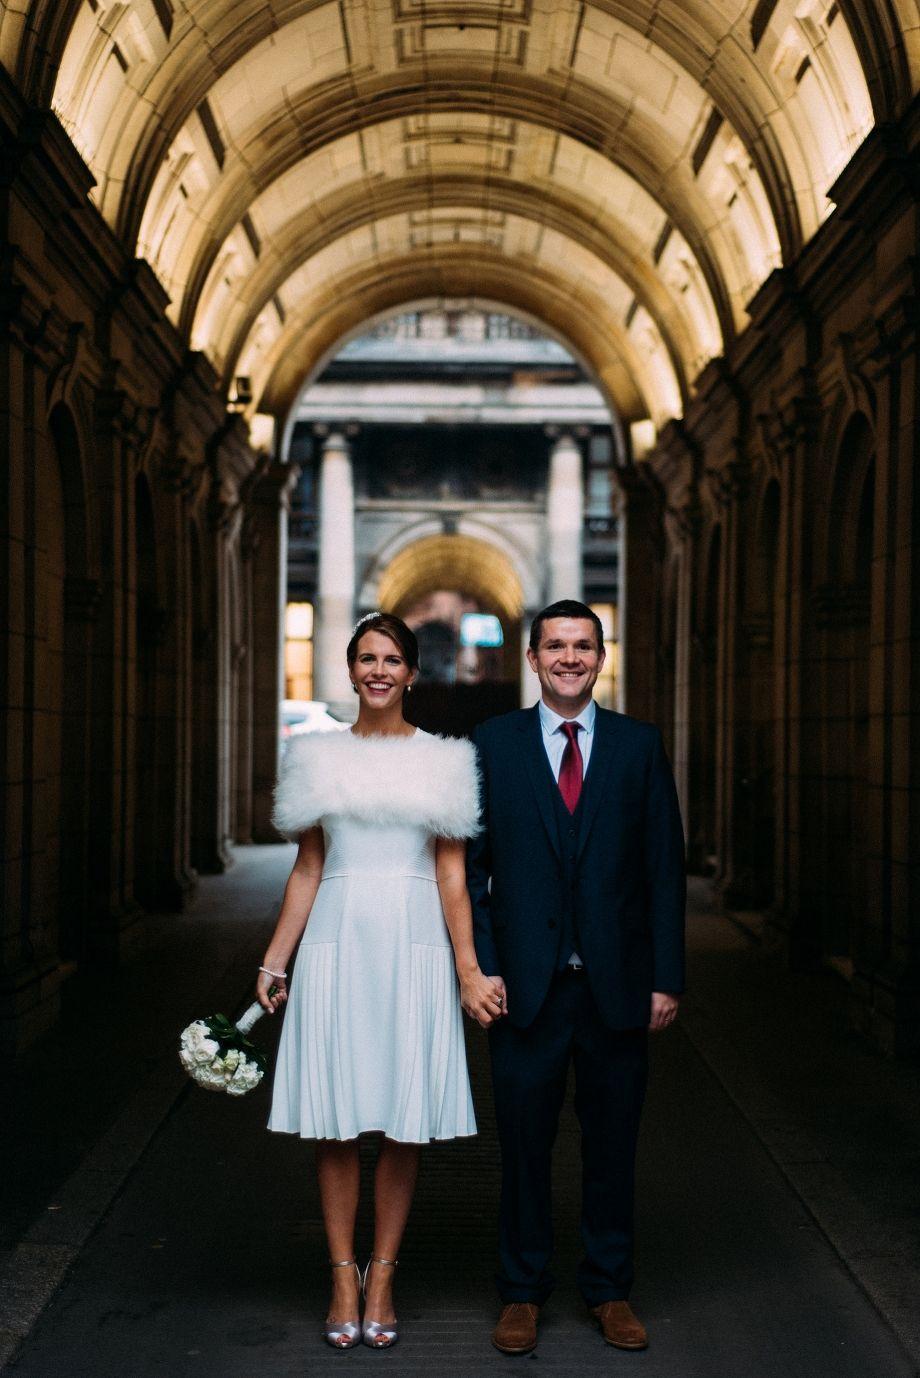 Quirky Scotland Elopement Glasgow Registry Office Wedding Photographer